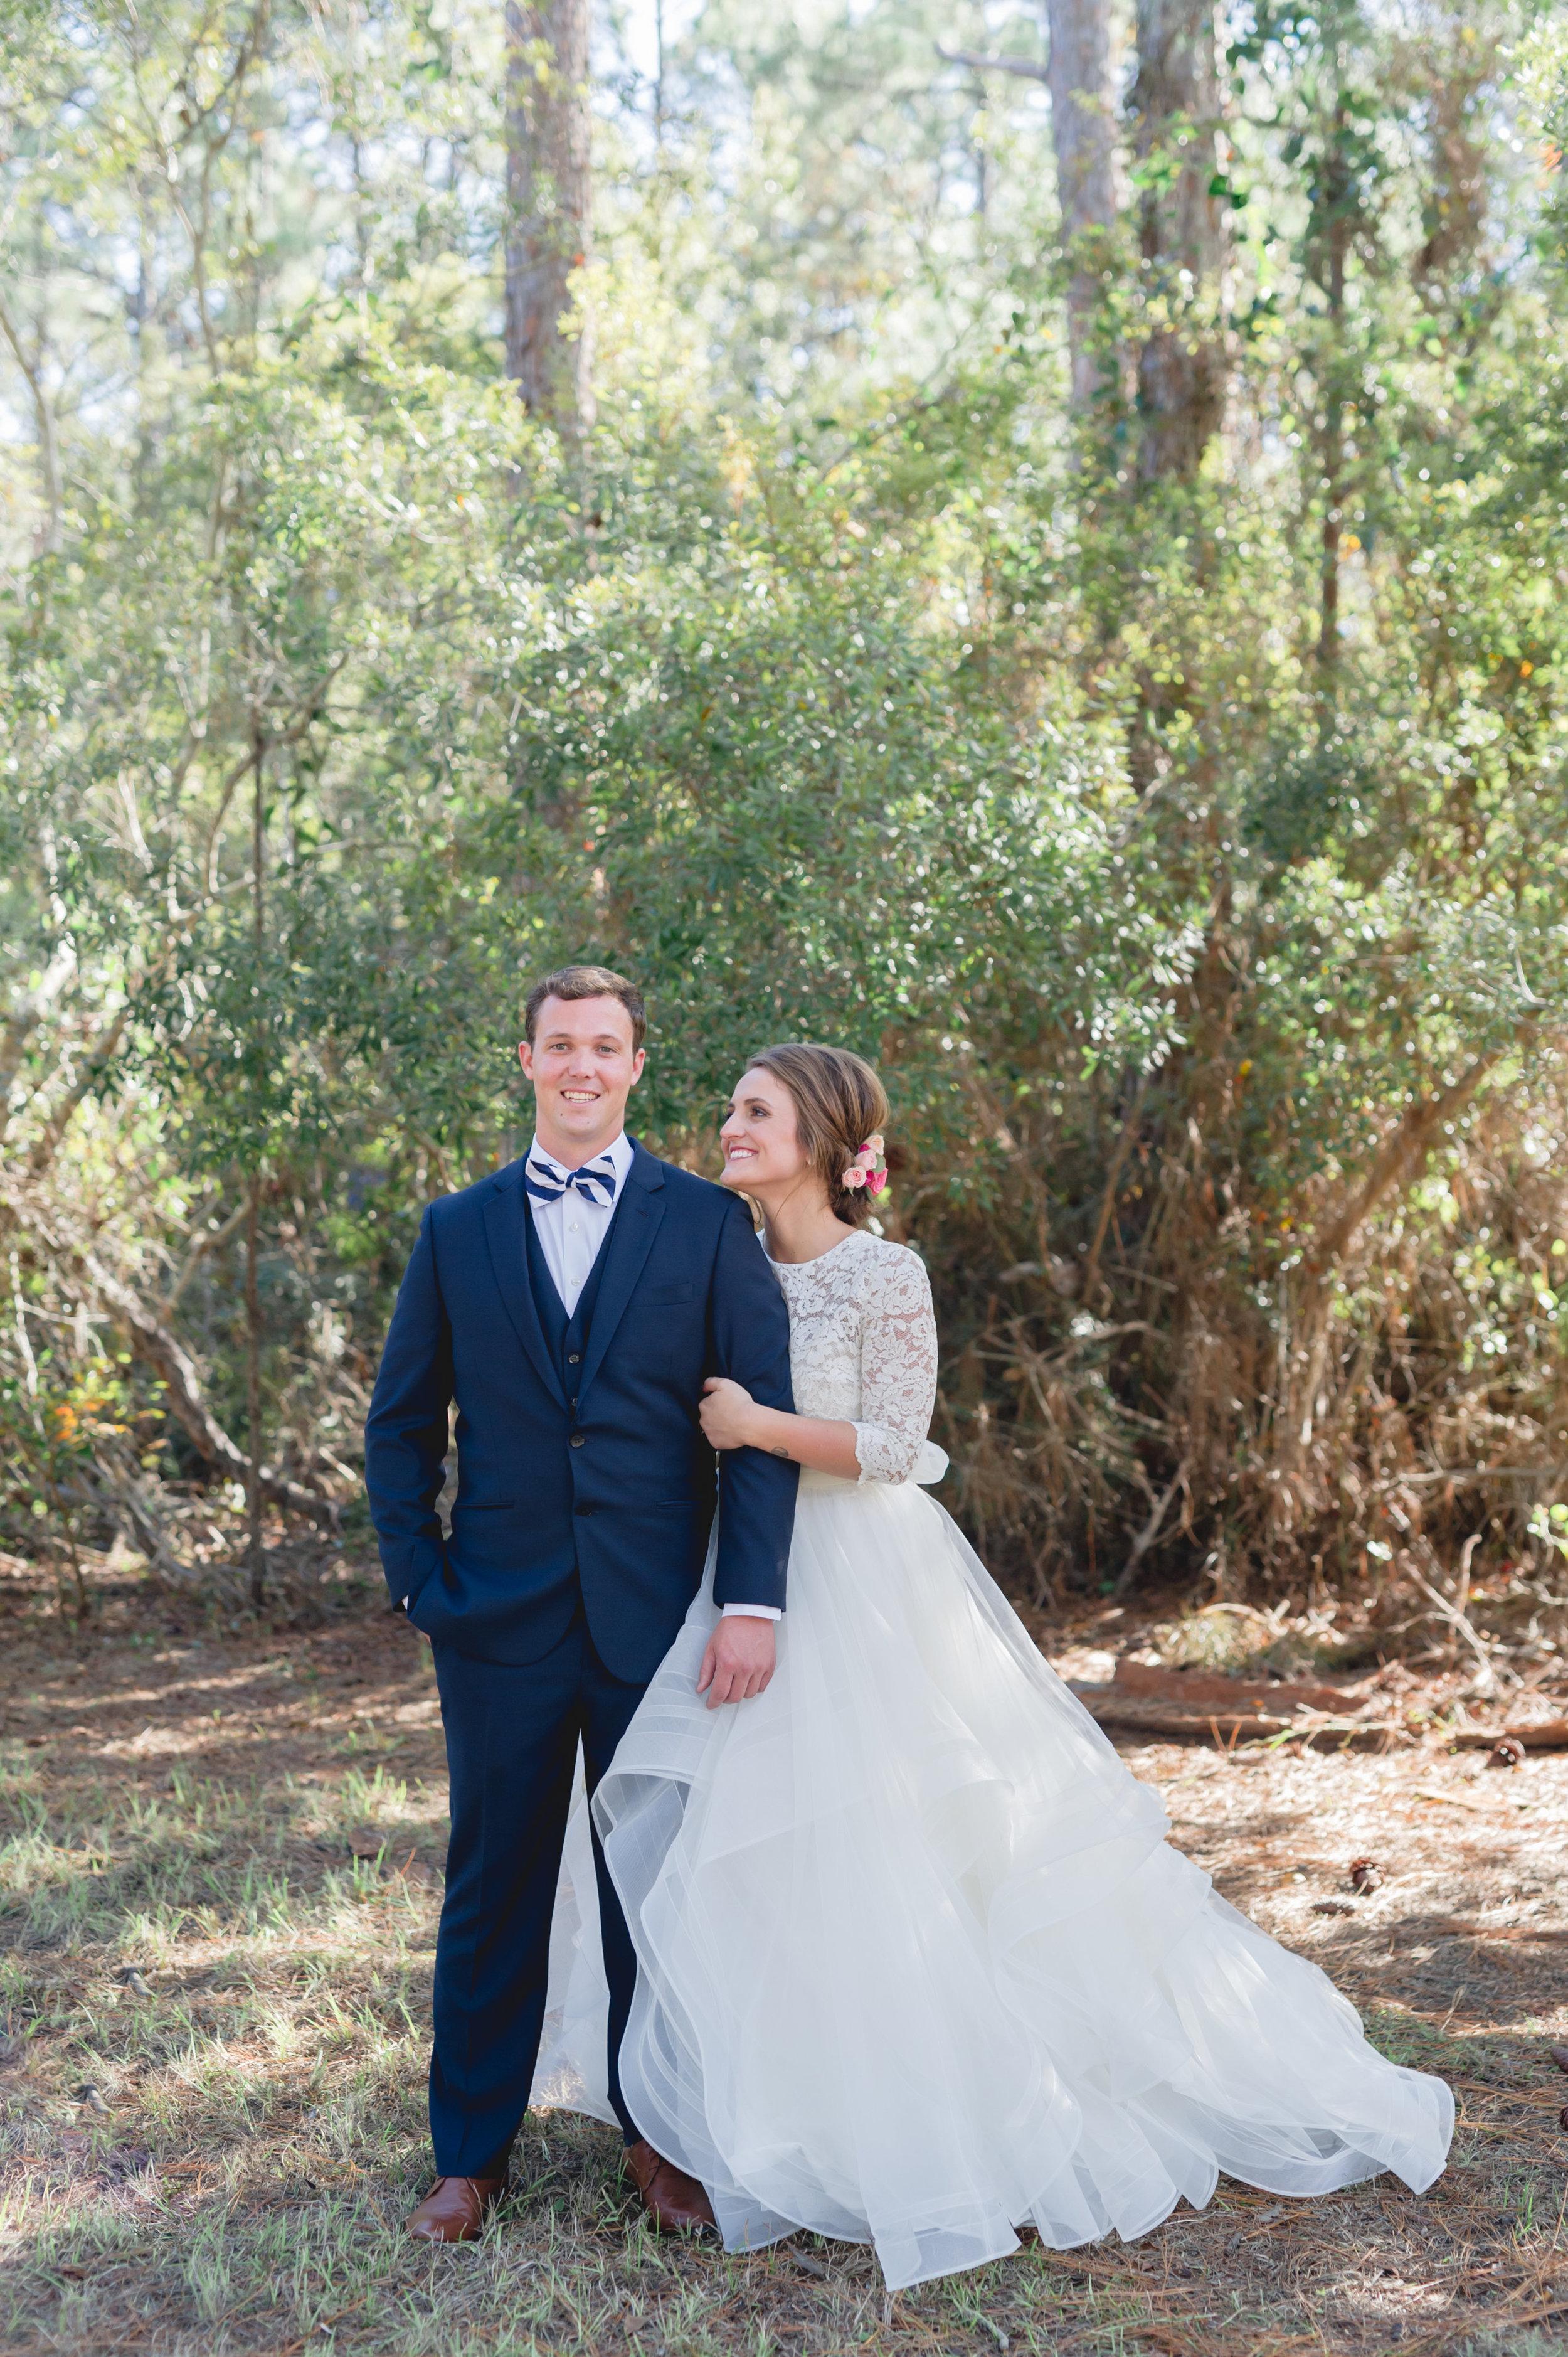 Joe Kendall Romantic Boho Wedding Gulf Shores AL-Bride and Groom-0111.jpg